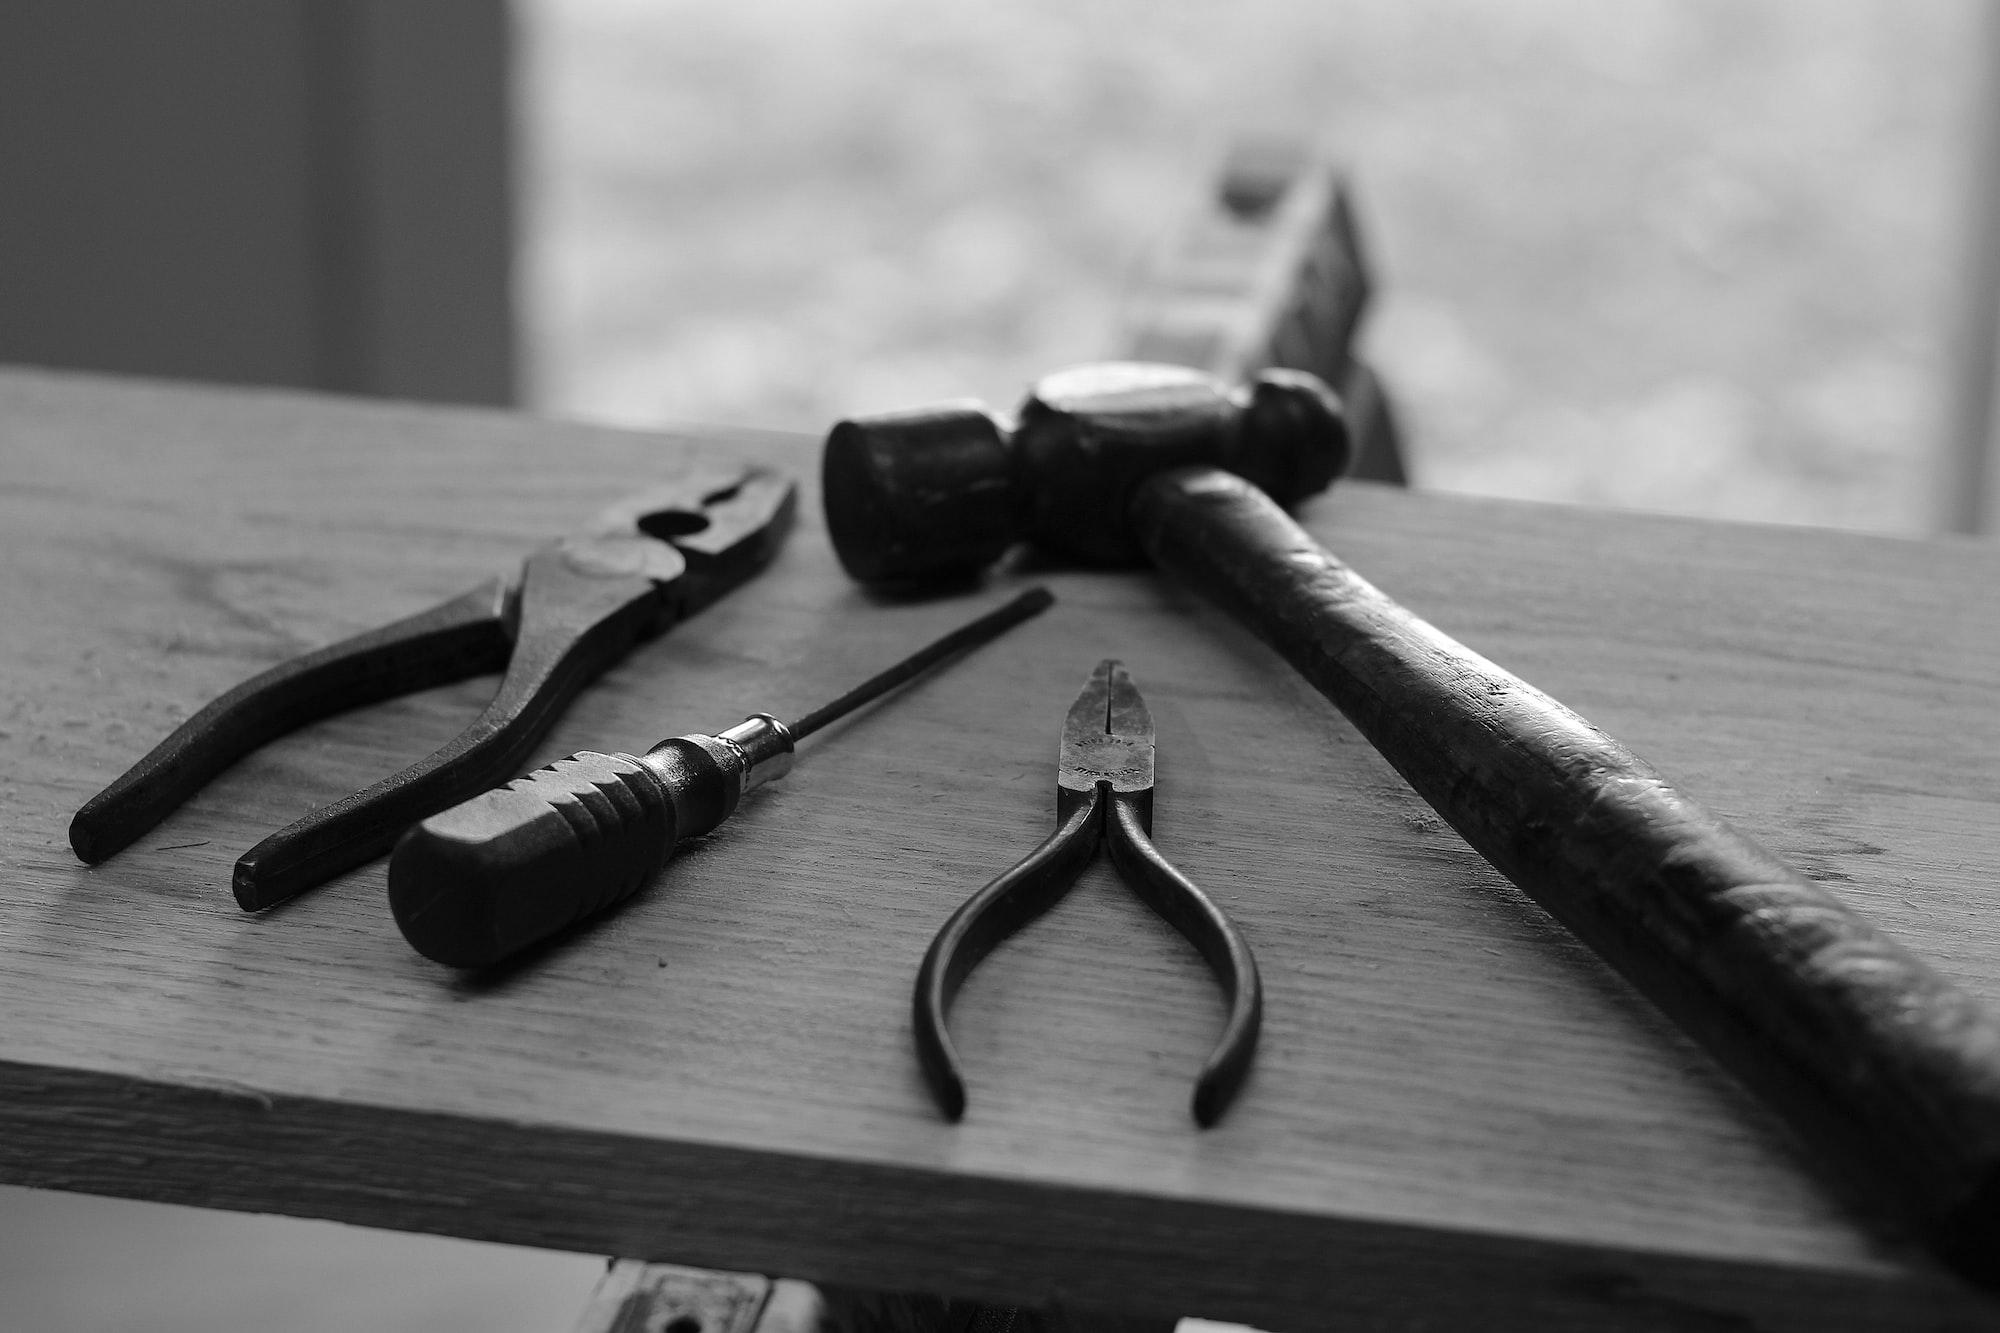 Writeup: Missing Tools